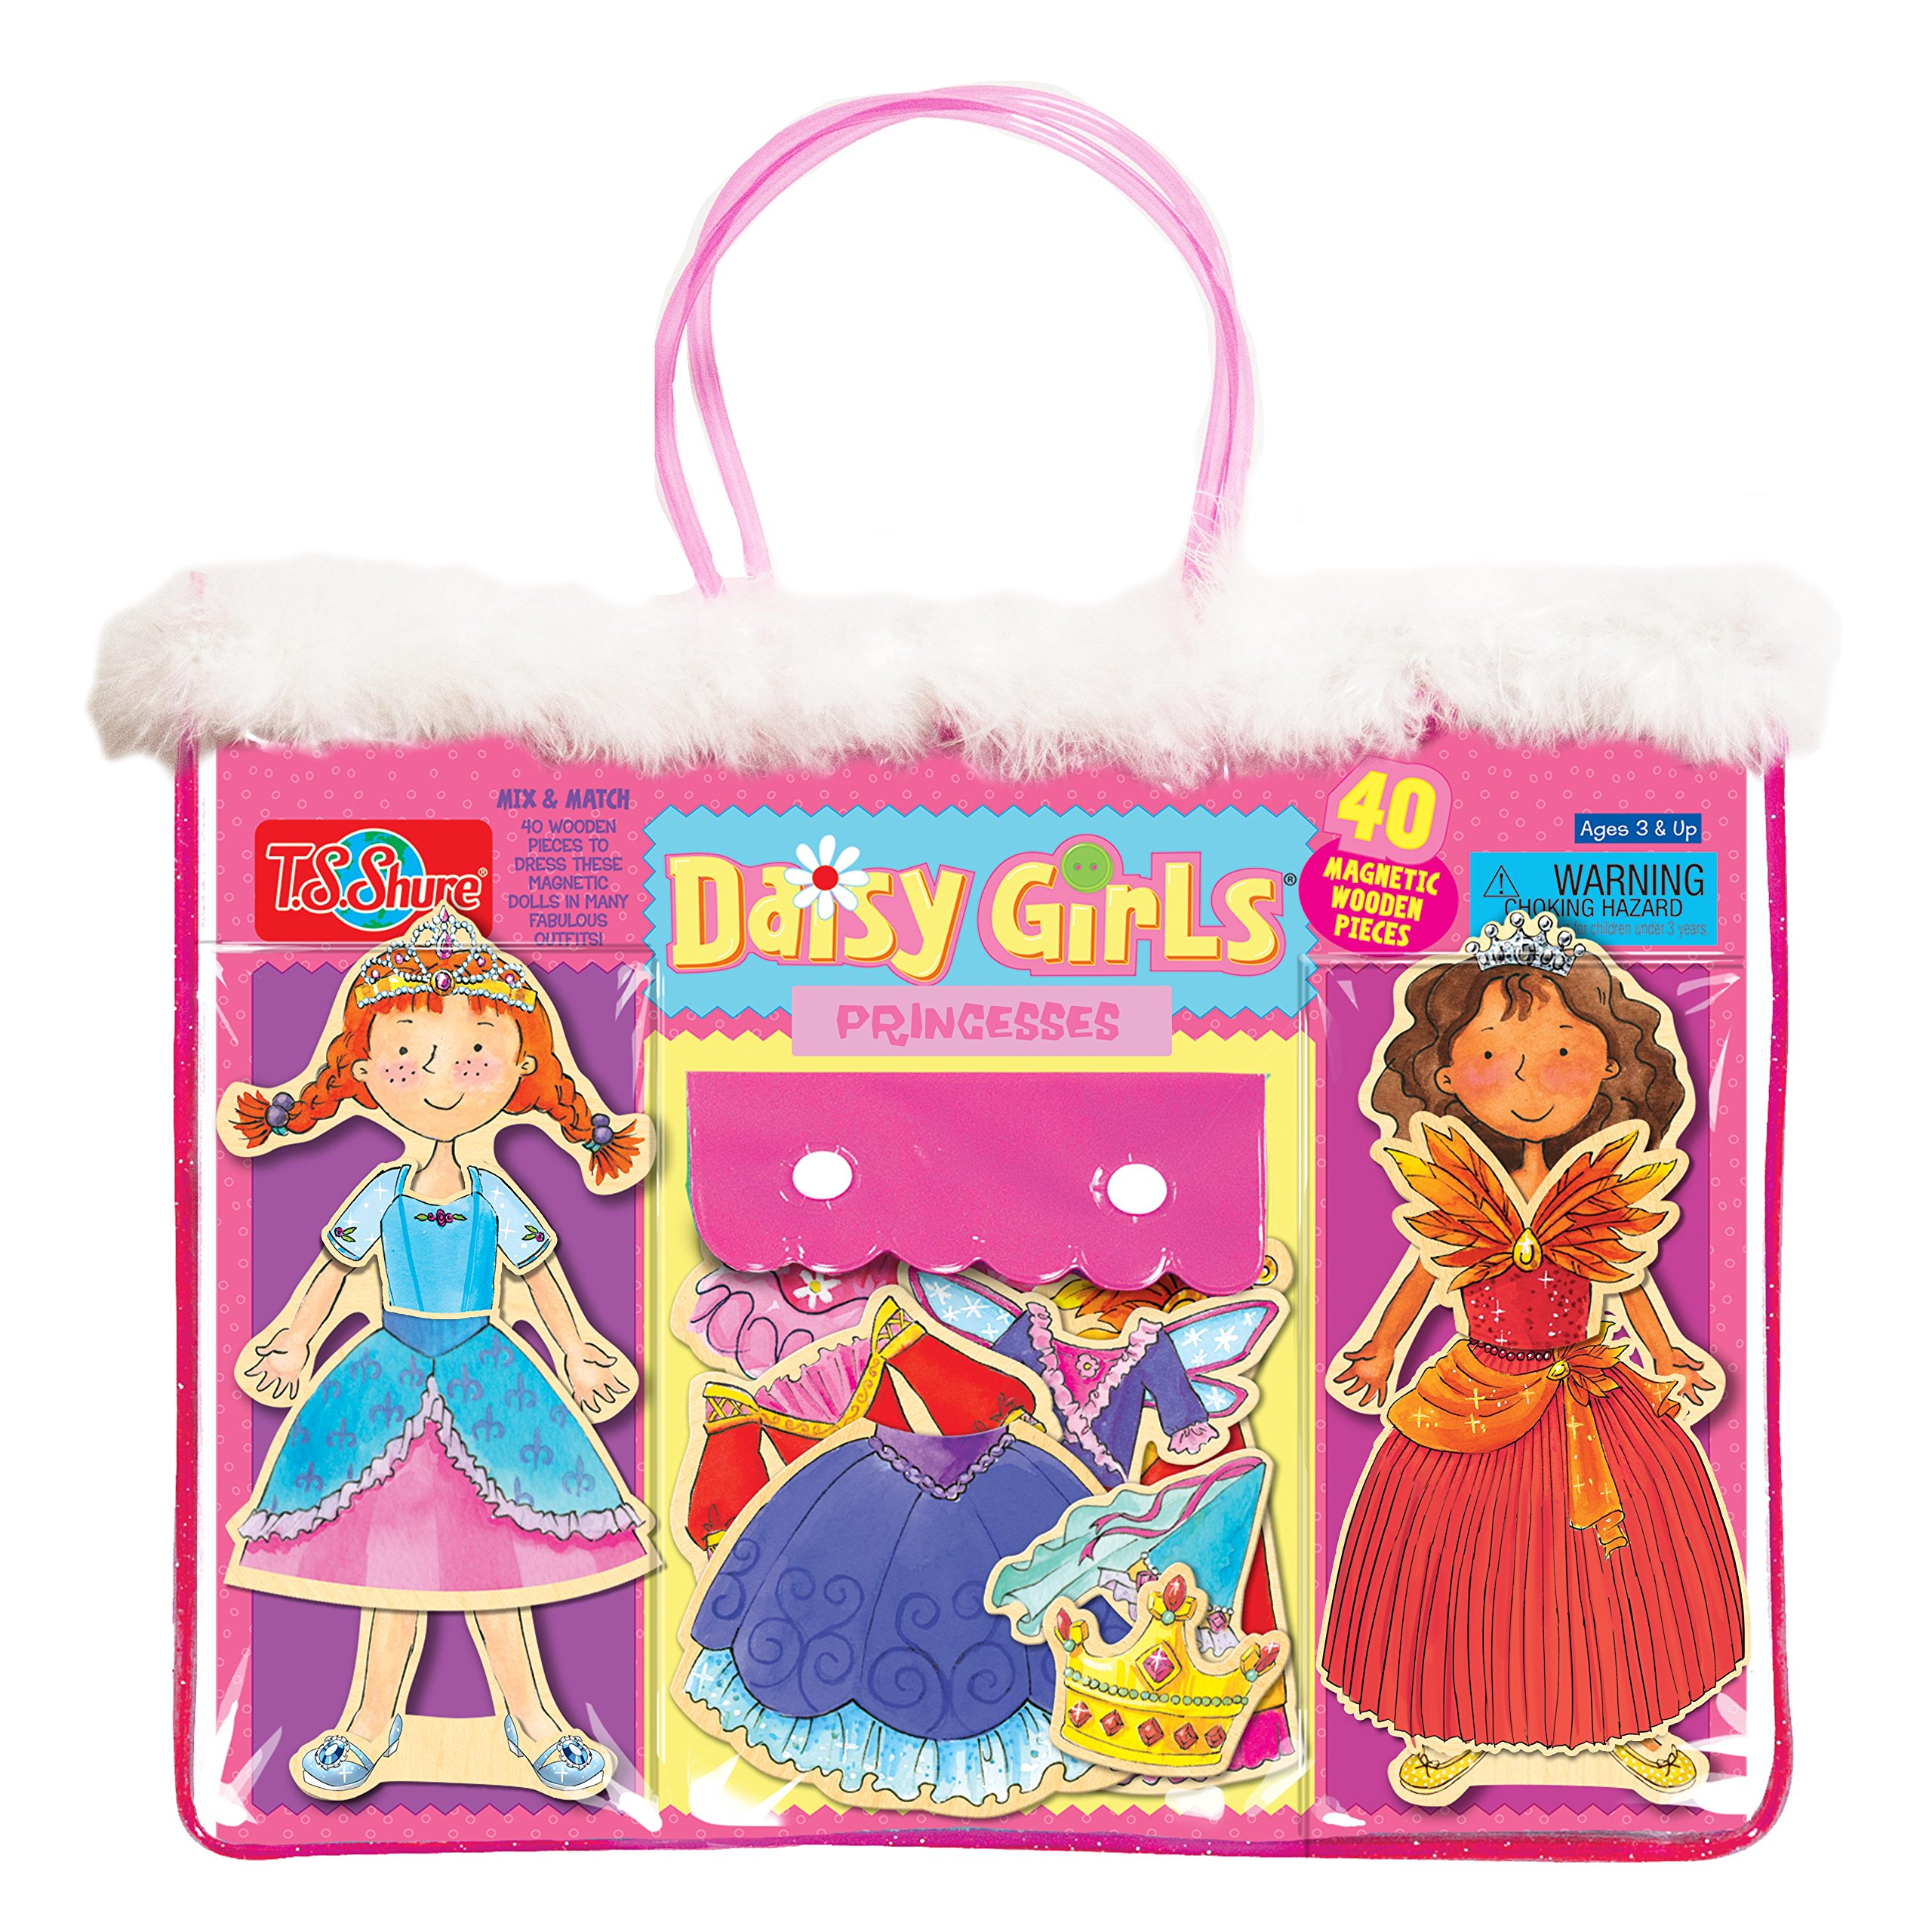 T.S. Shure Daisy Girls Princesses Wooden Magnetic Dress-Up Dolls Wooden Magnetic Dolls